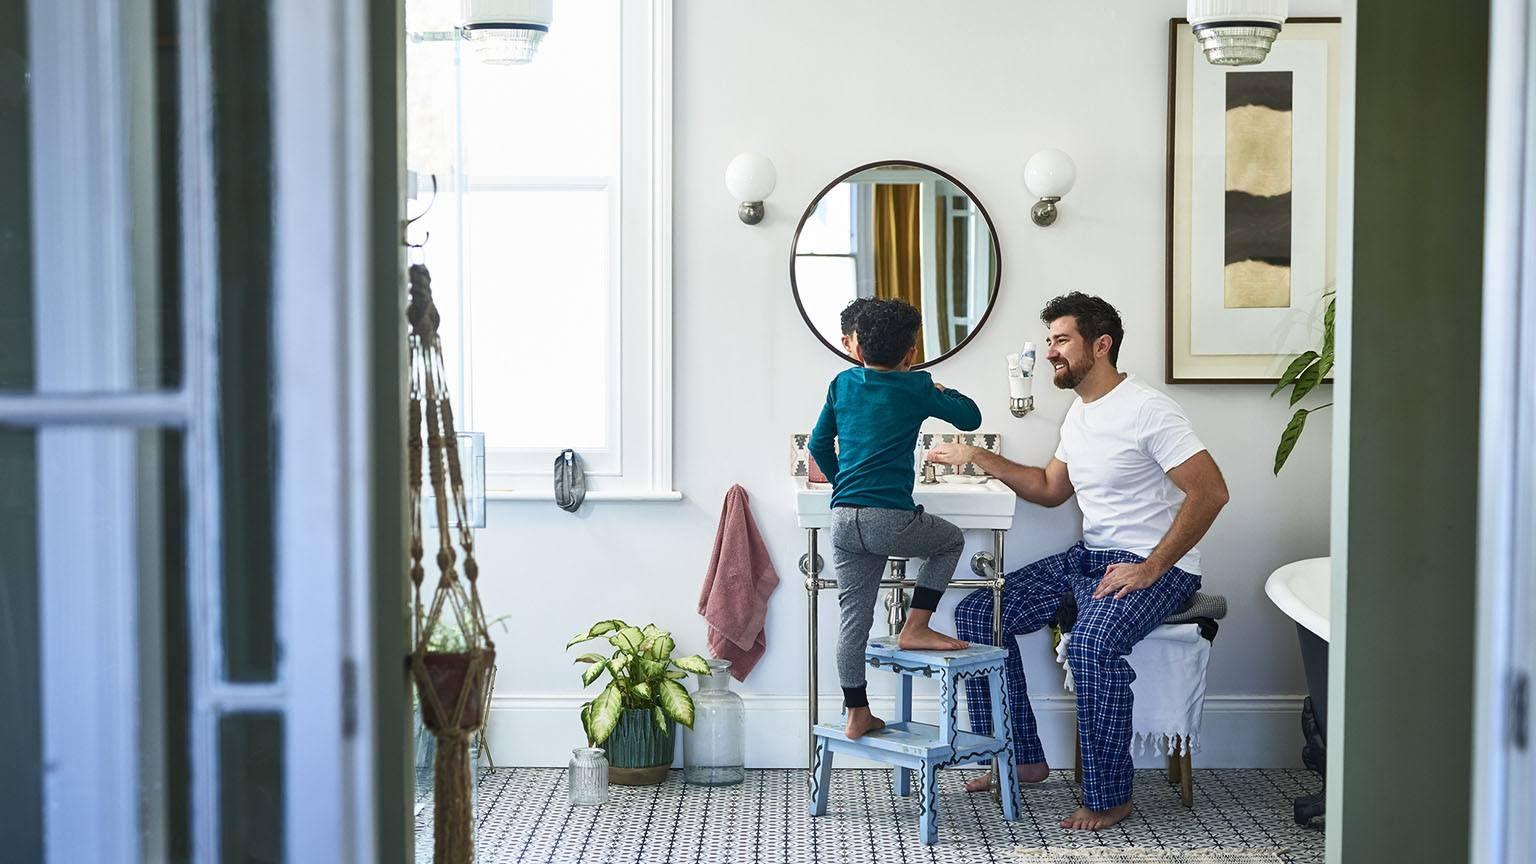 Father helping son brushing teeth